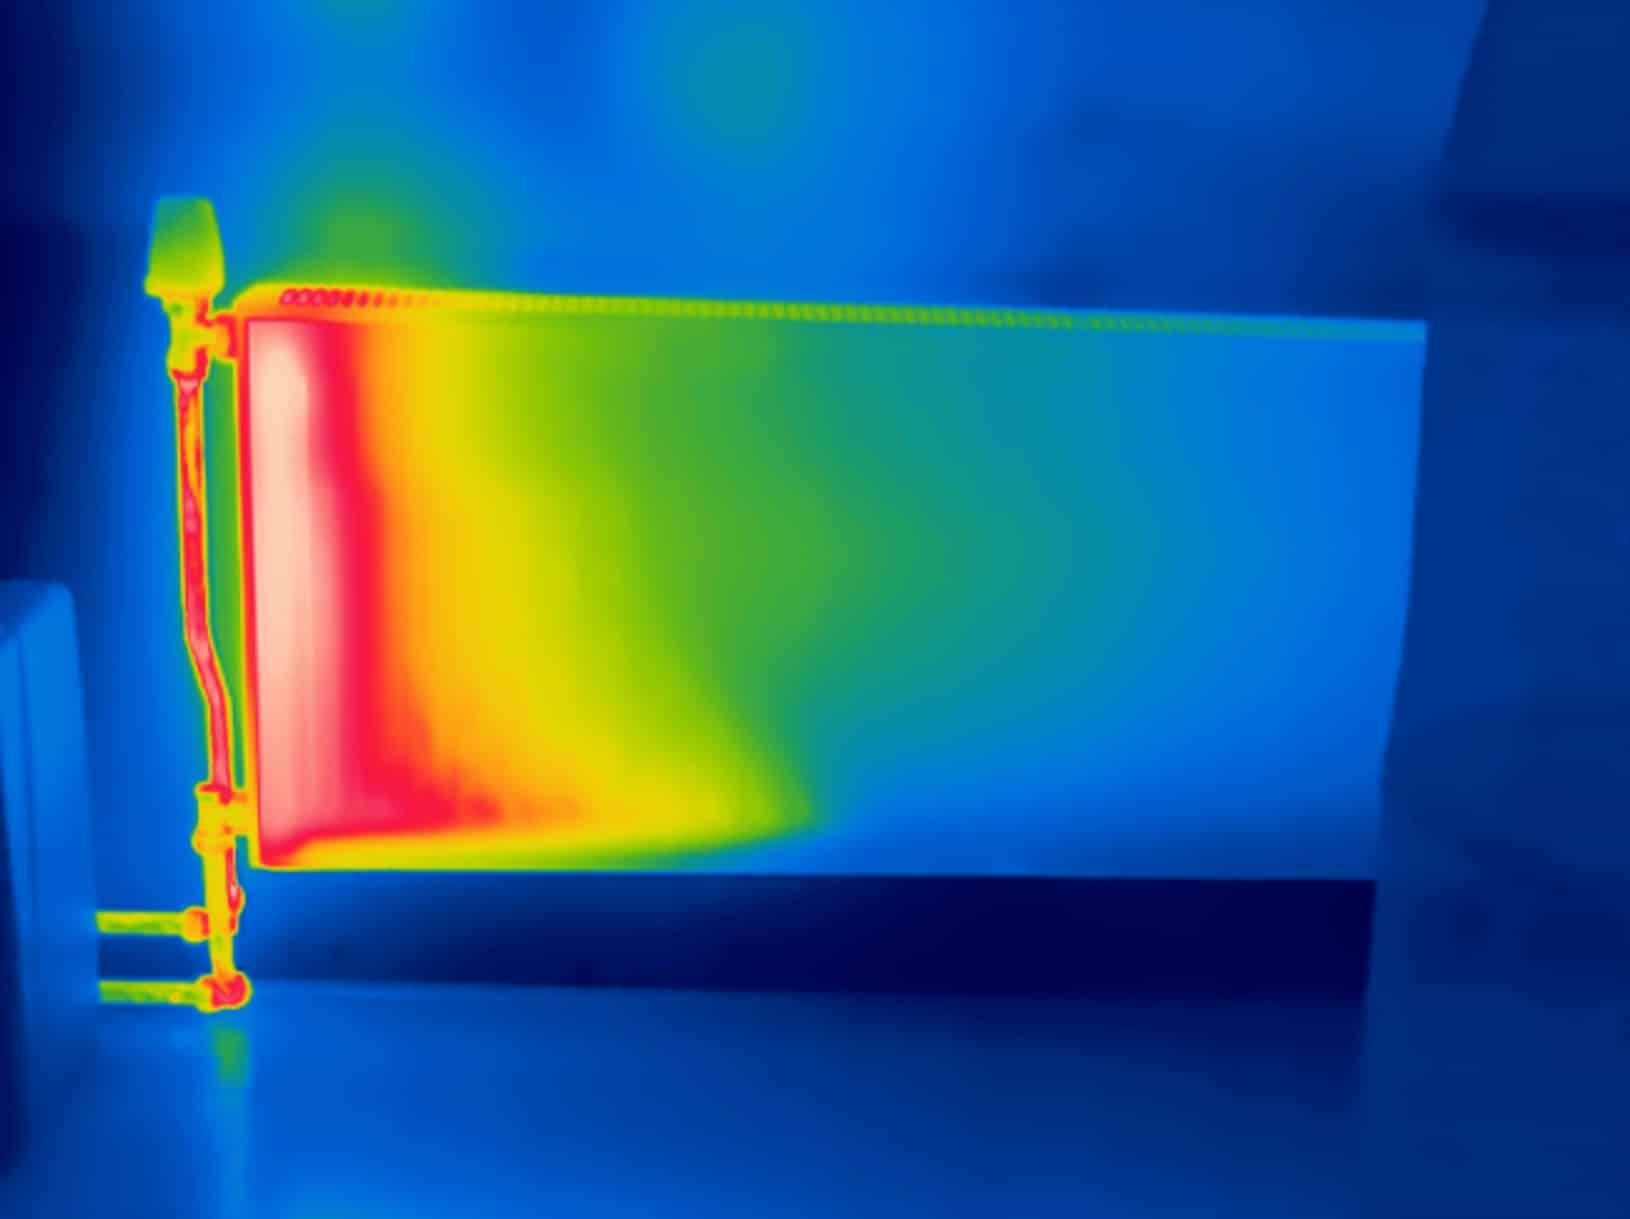 Woning thermografietoont slecht functionerende verwamingsradiator